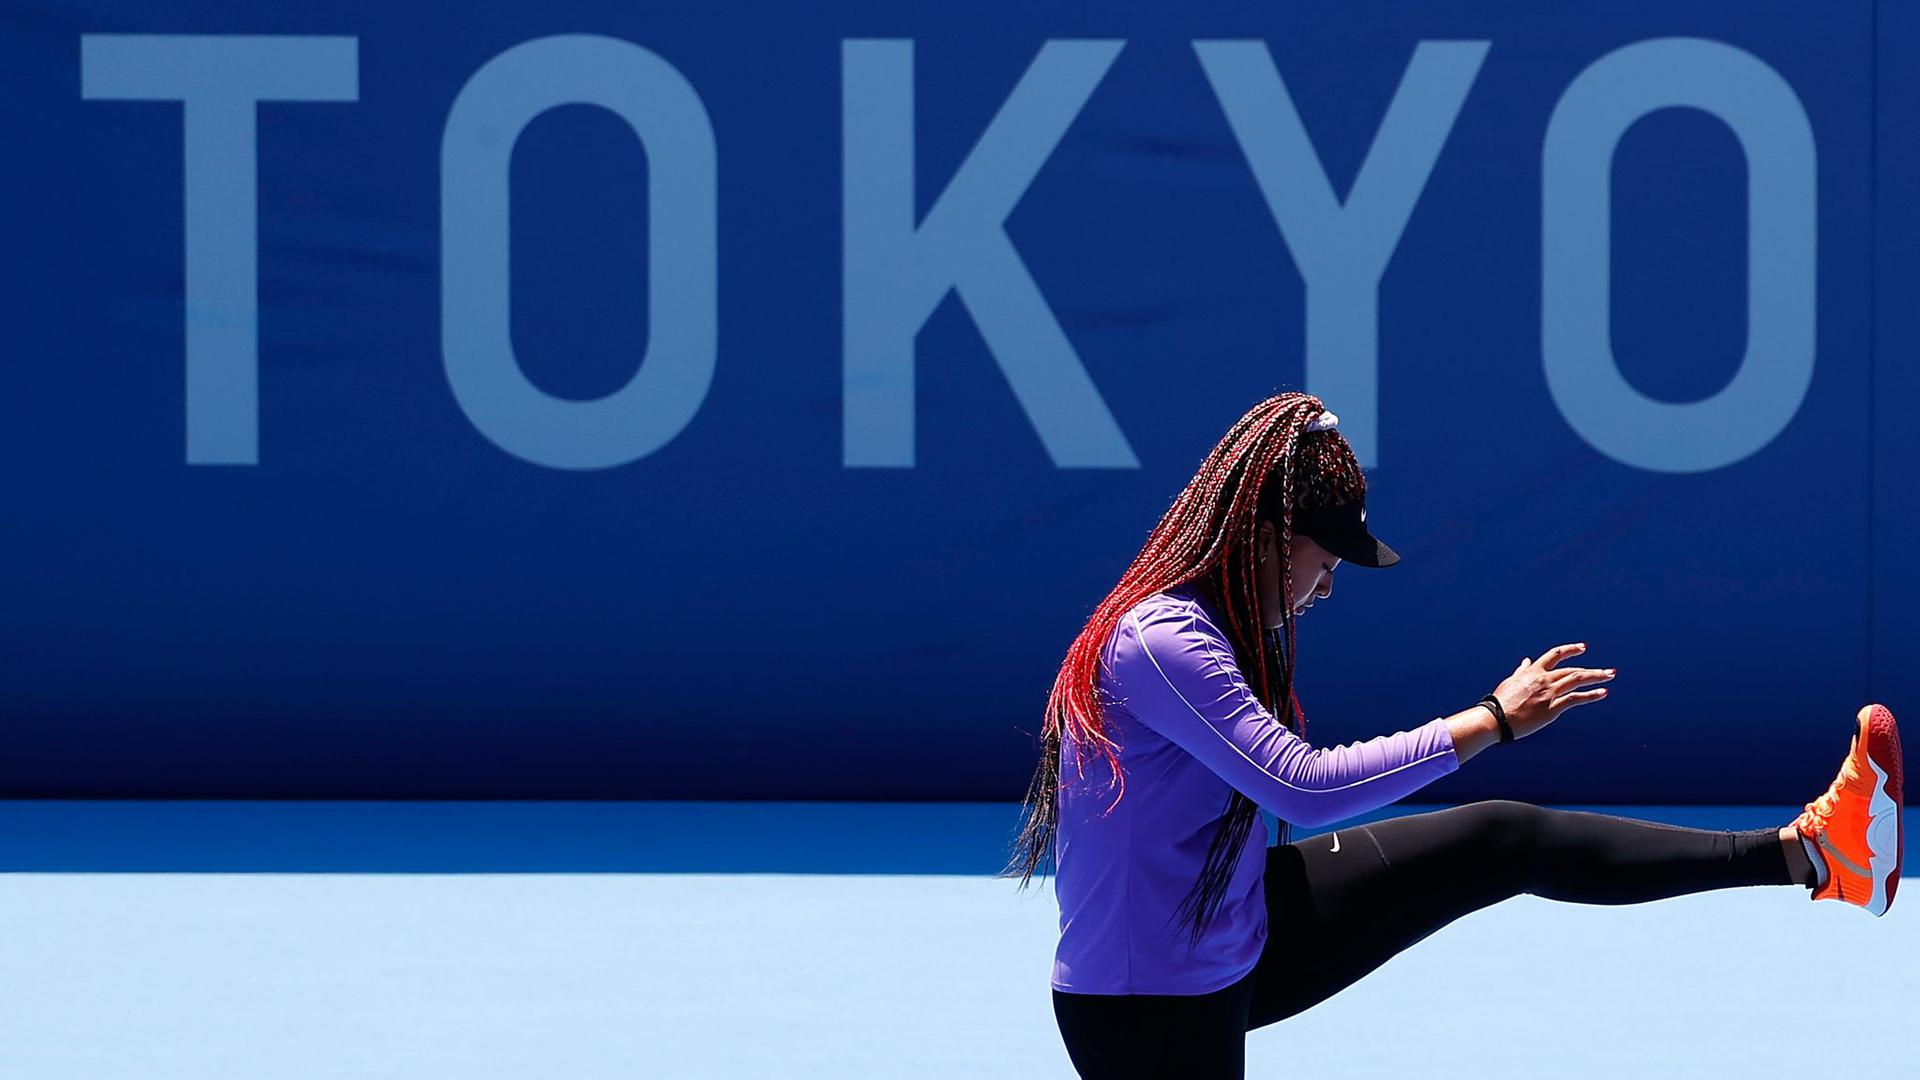 Steht in Tokio besonders im Fokus: Tennis-Star Naomi Osaka.